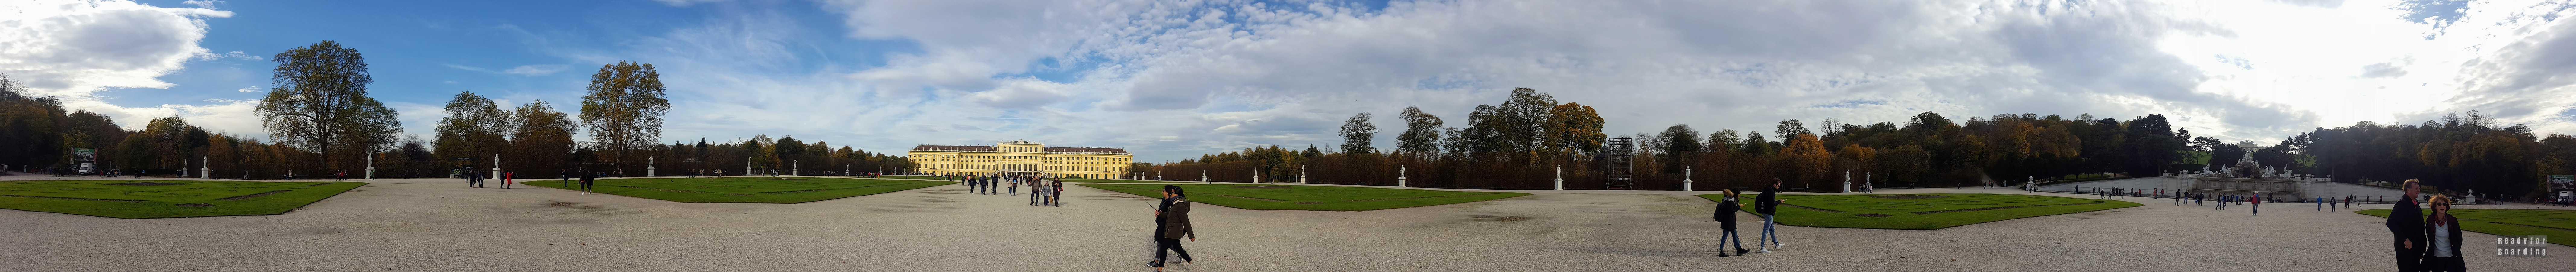 Panorama: Pałac Schönbrunn, Wiedeń - Austria